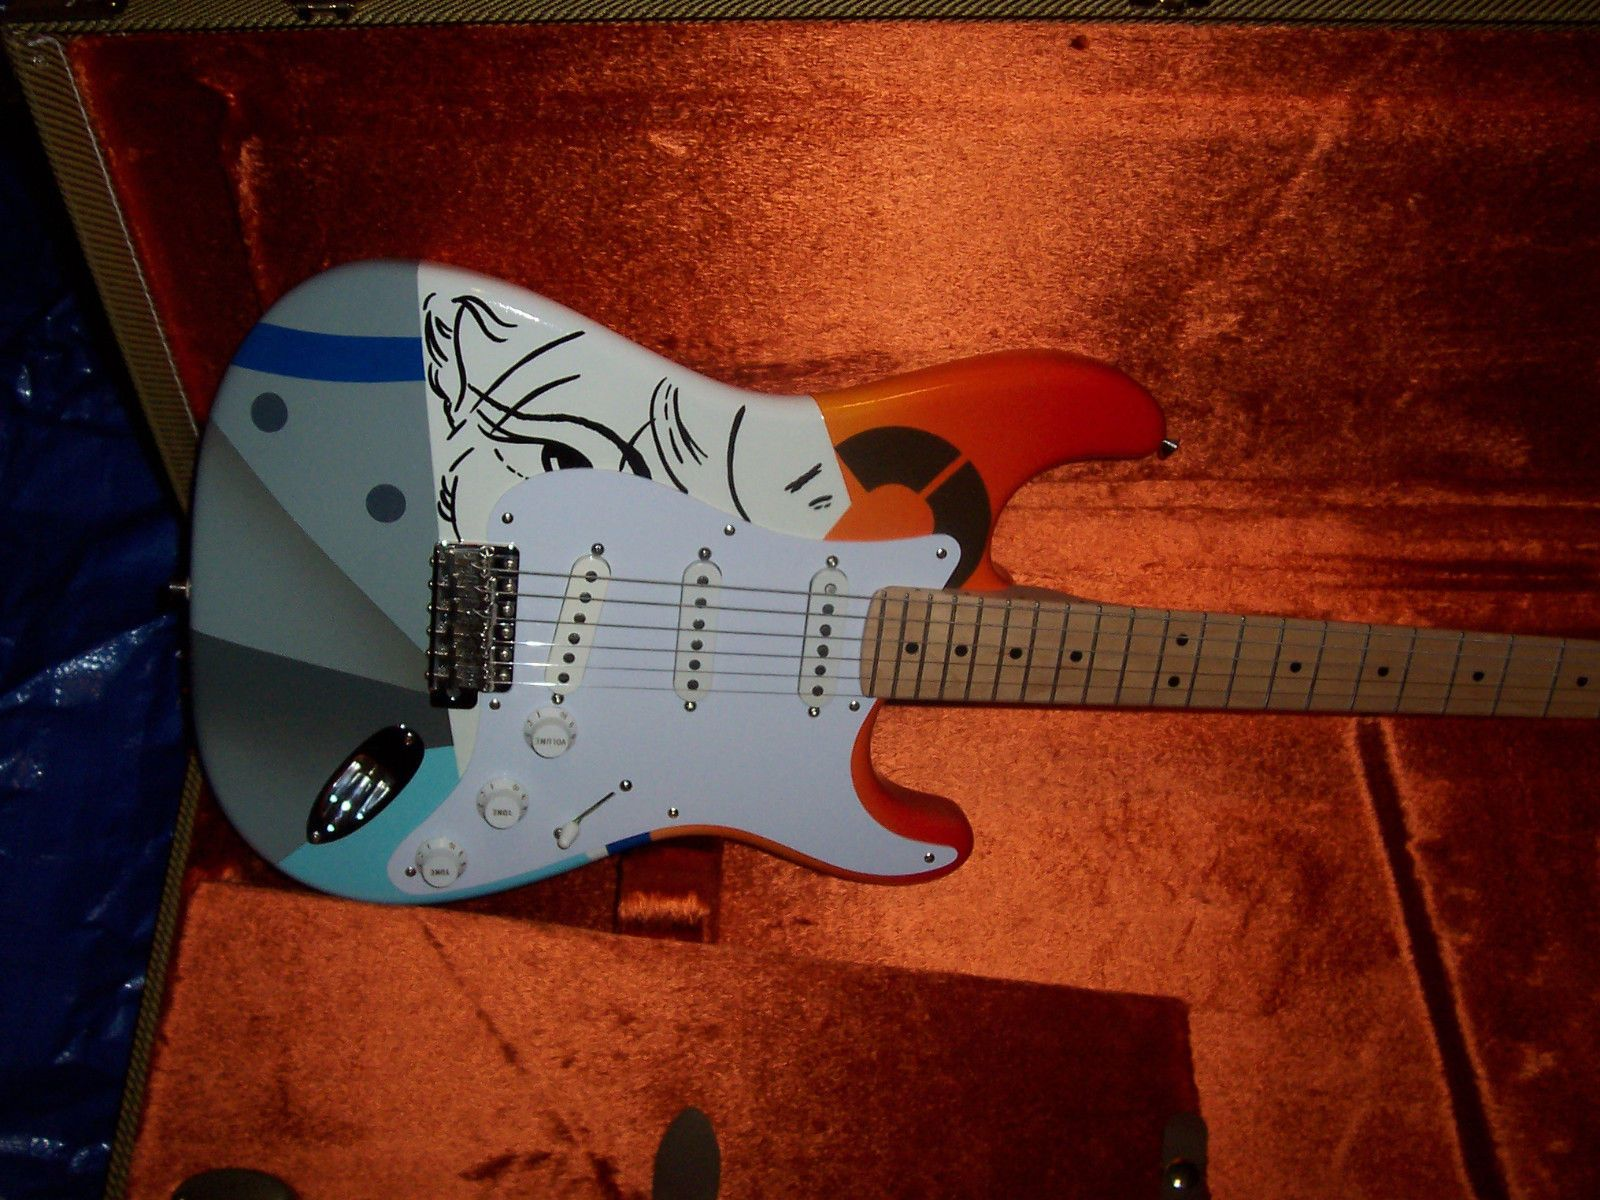 medium resolution of crash 1 eric clapton fender stratocaster guitar strat usa american vintage desig